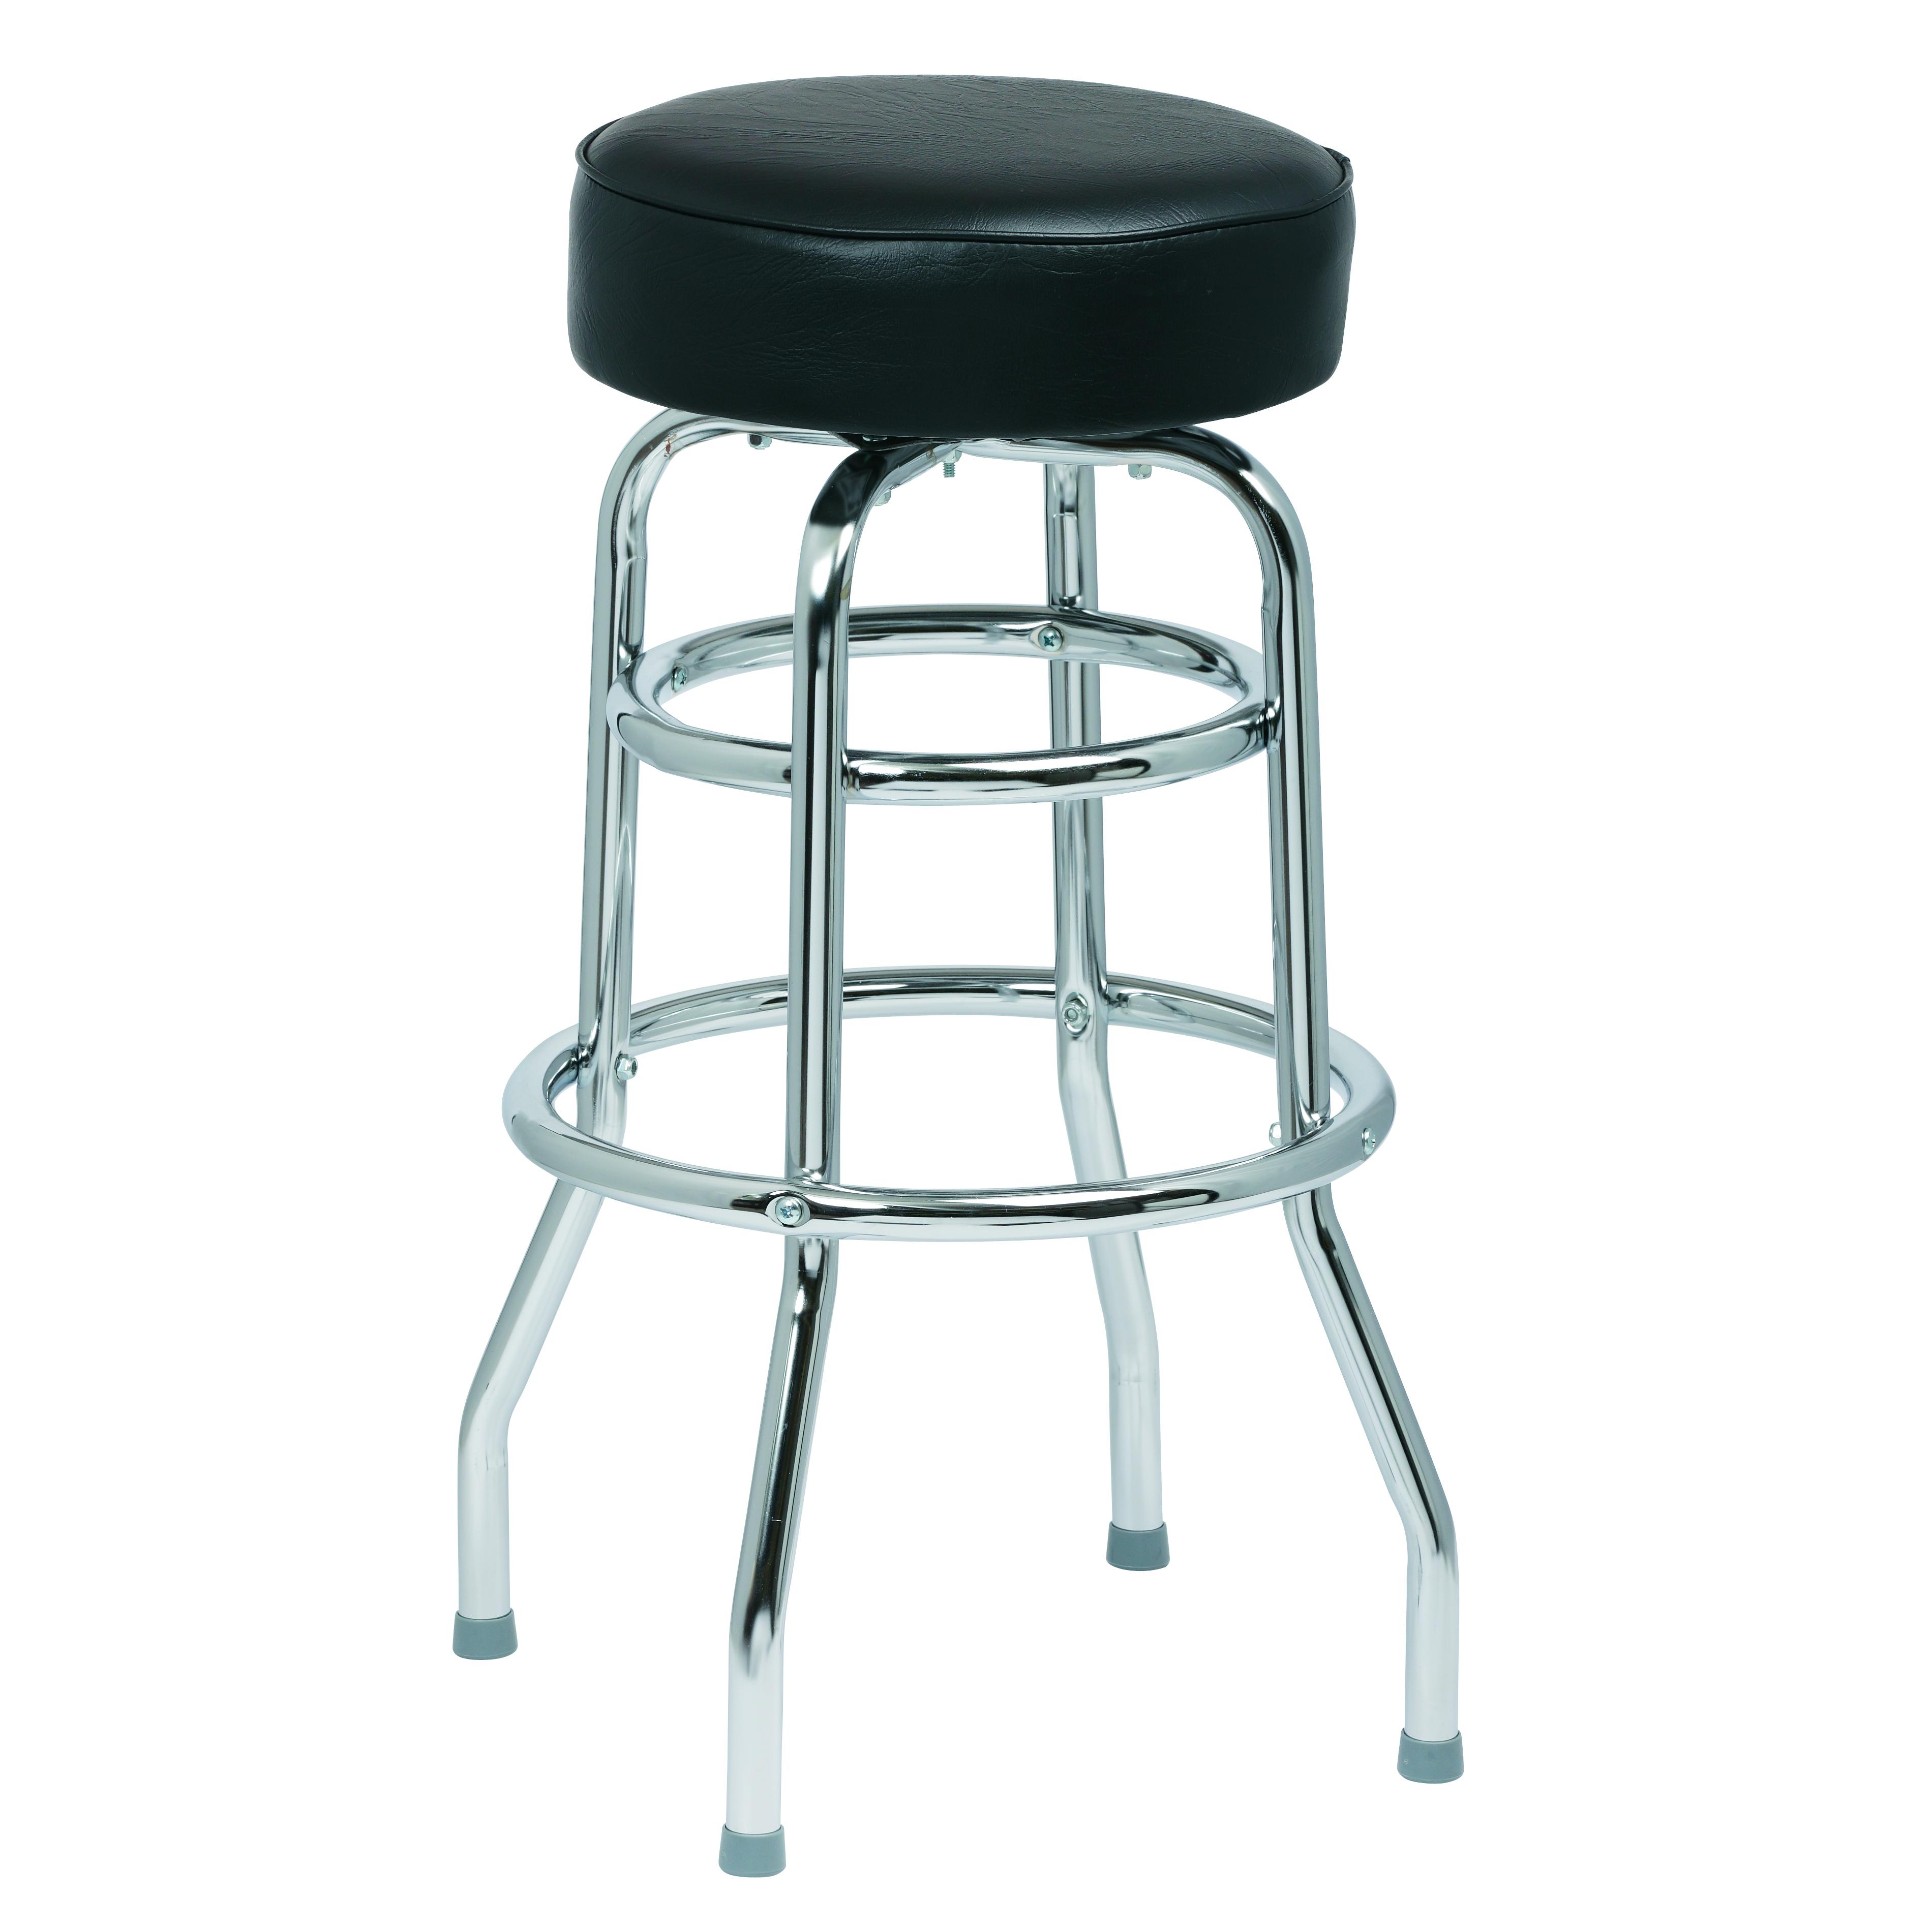 Royal Industries ROY 7712 B bar stool, swivel, indoor